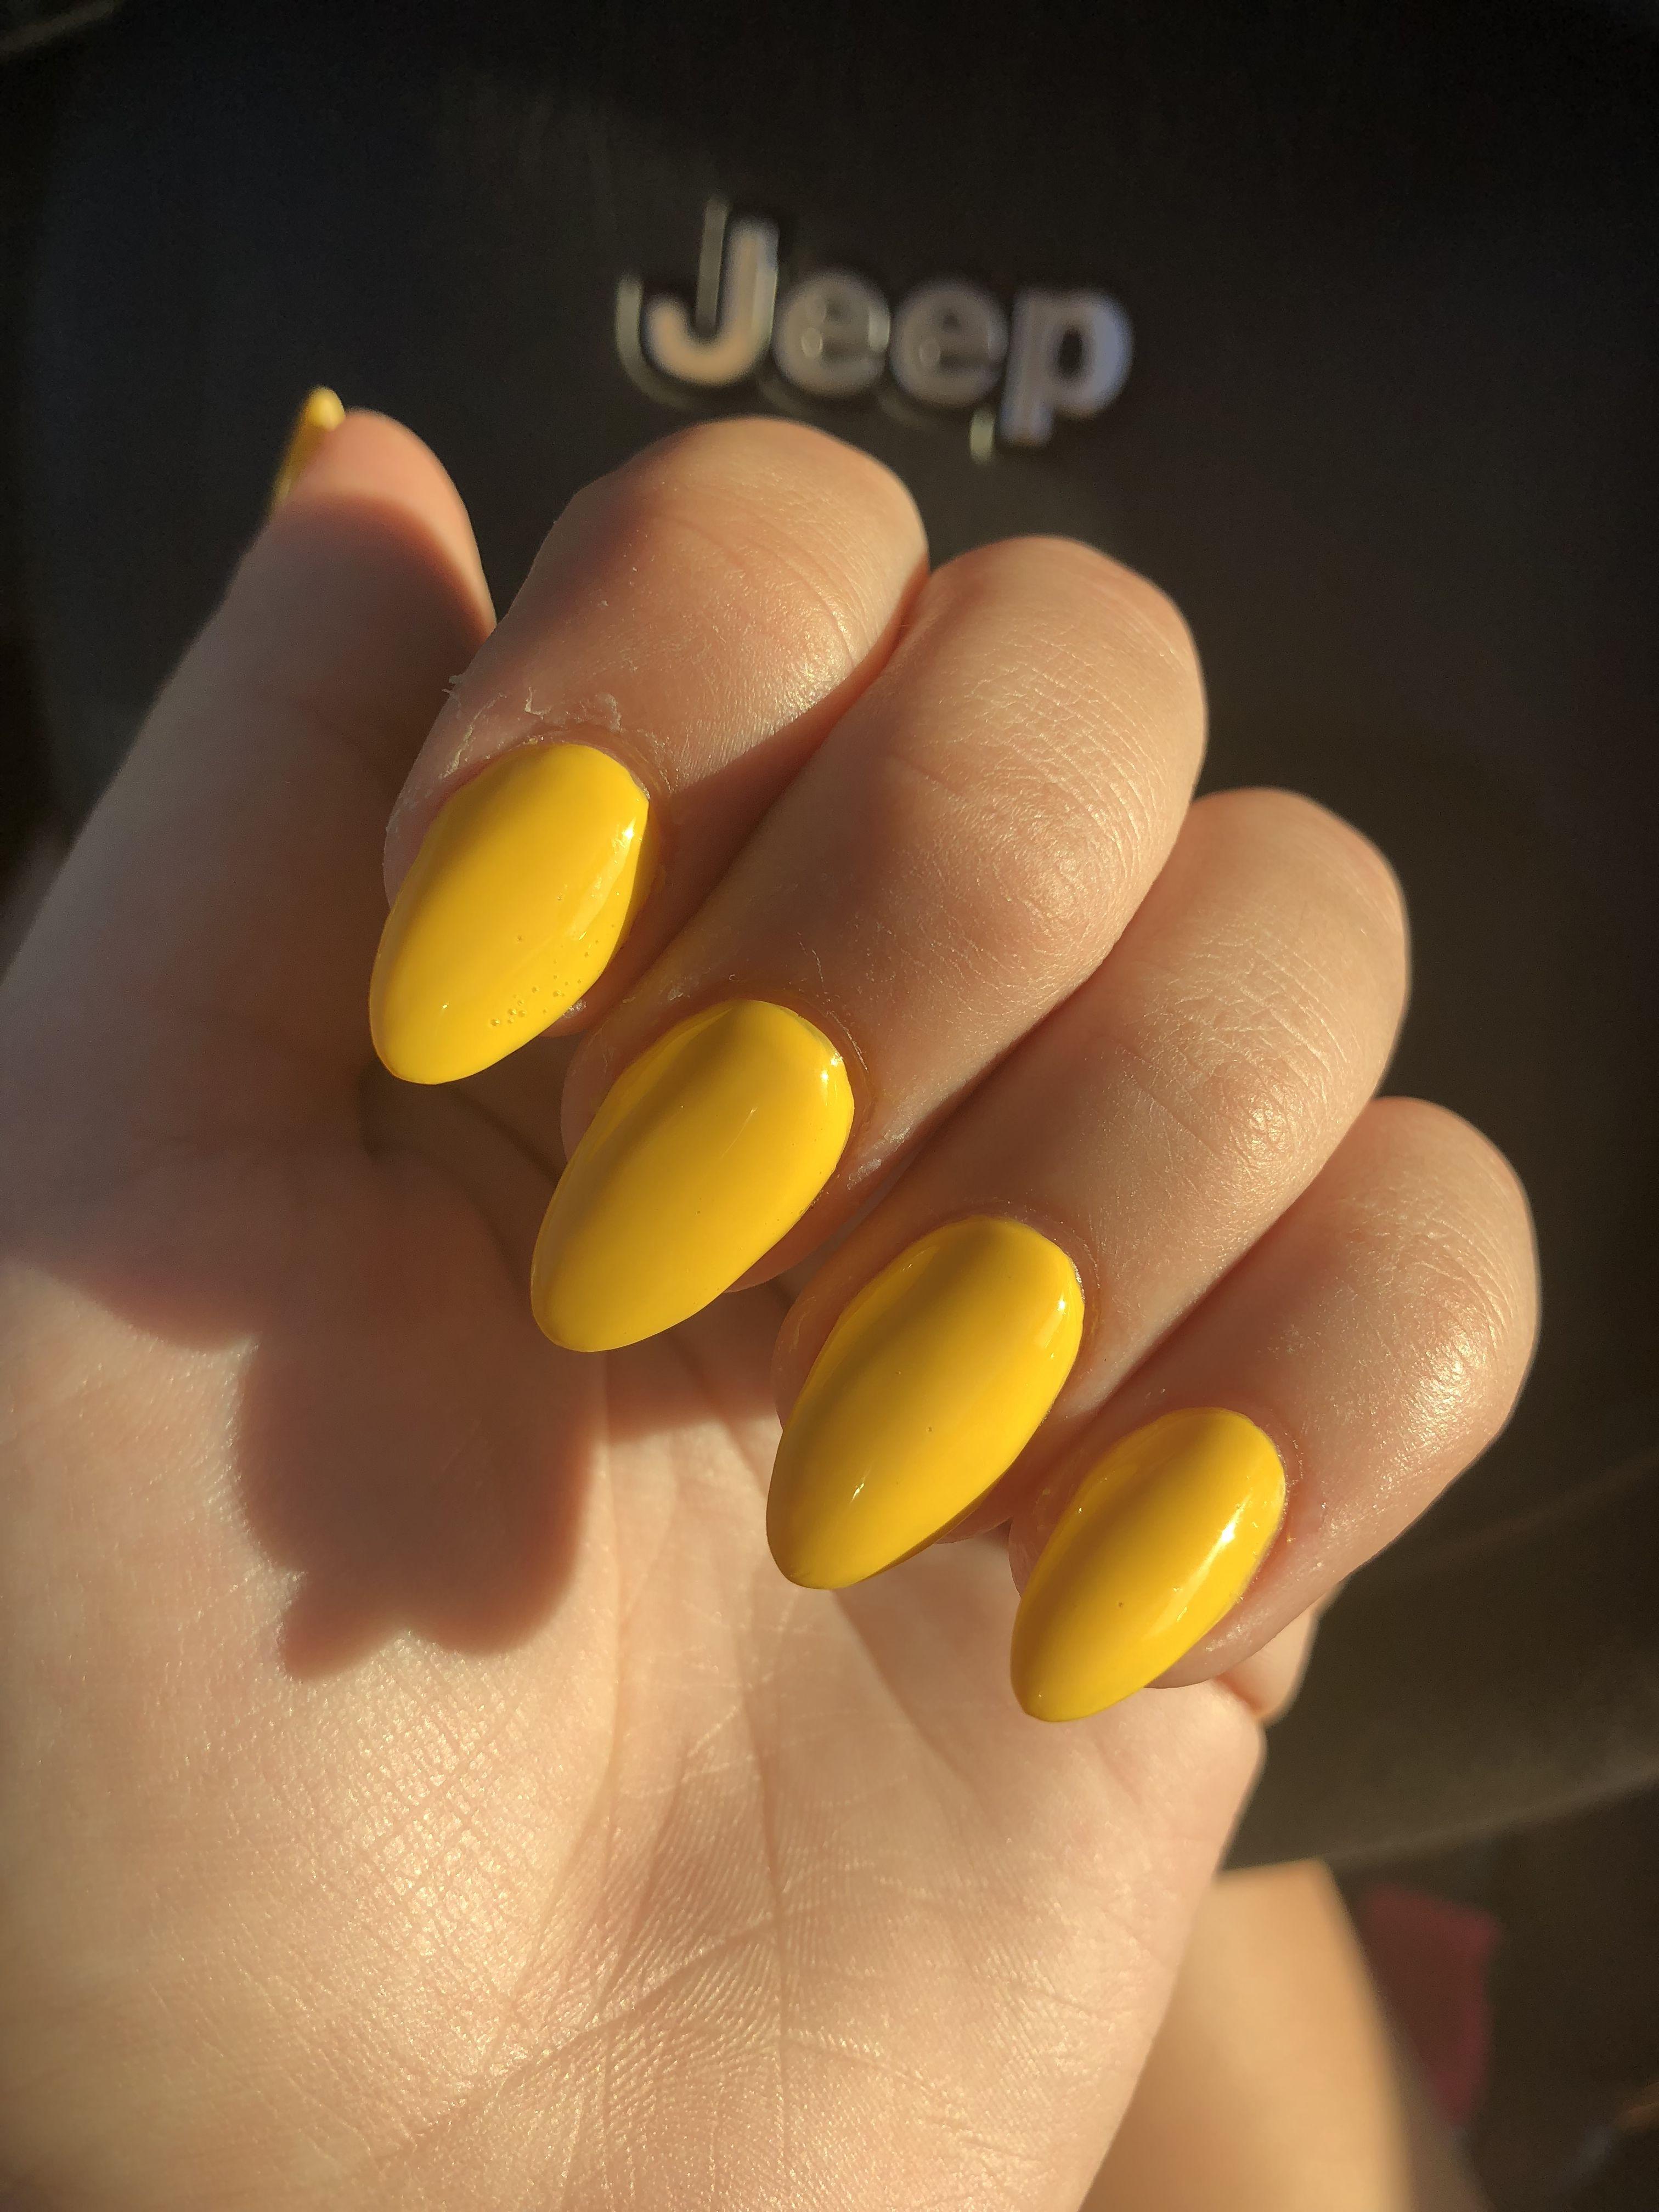 Yellow Acrylic Nails Acrylic Nails Yellow Nail Designs Summer Acrylic Yellow Nails